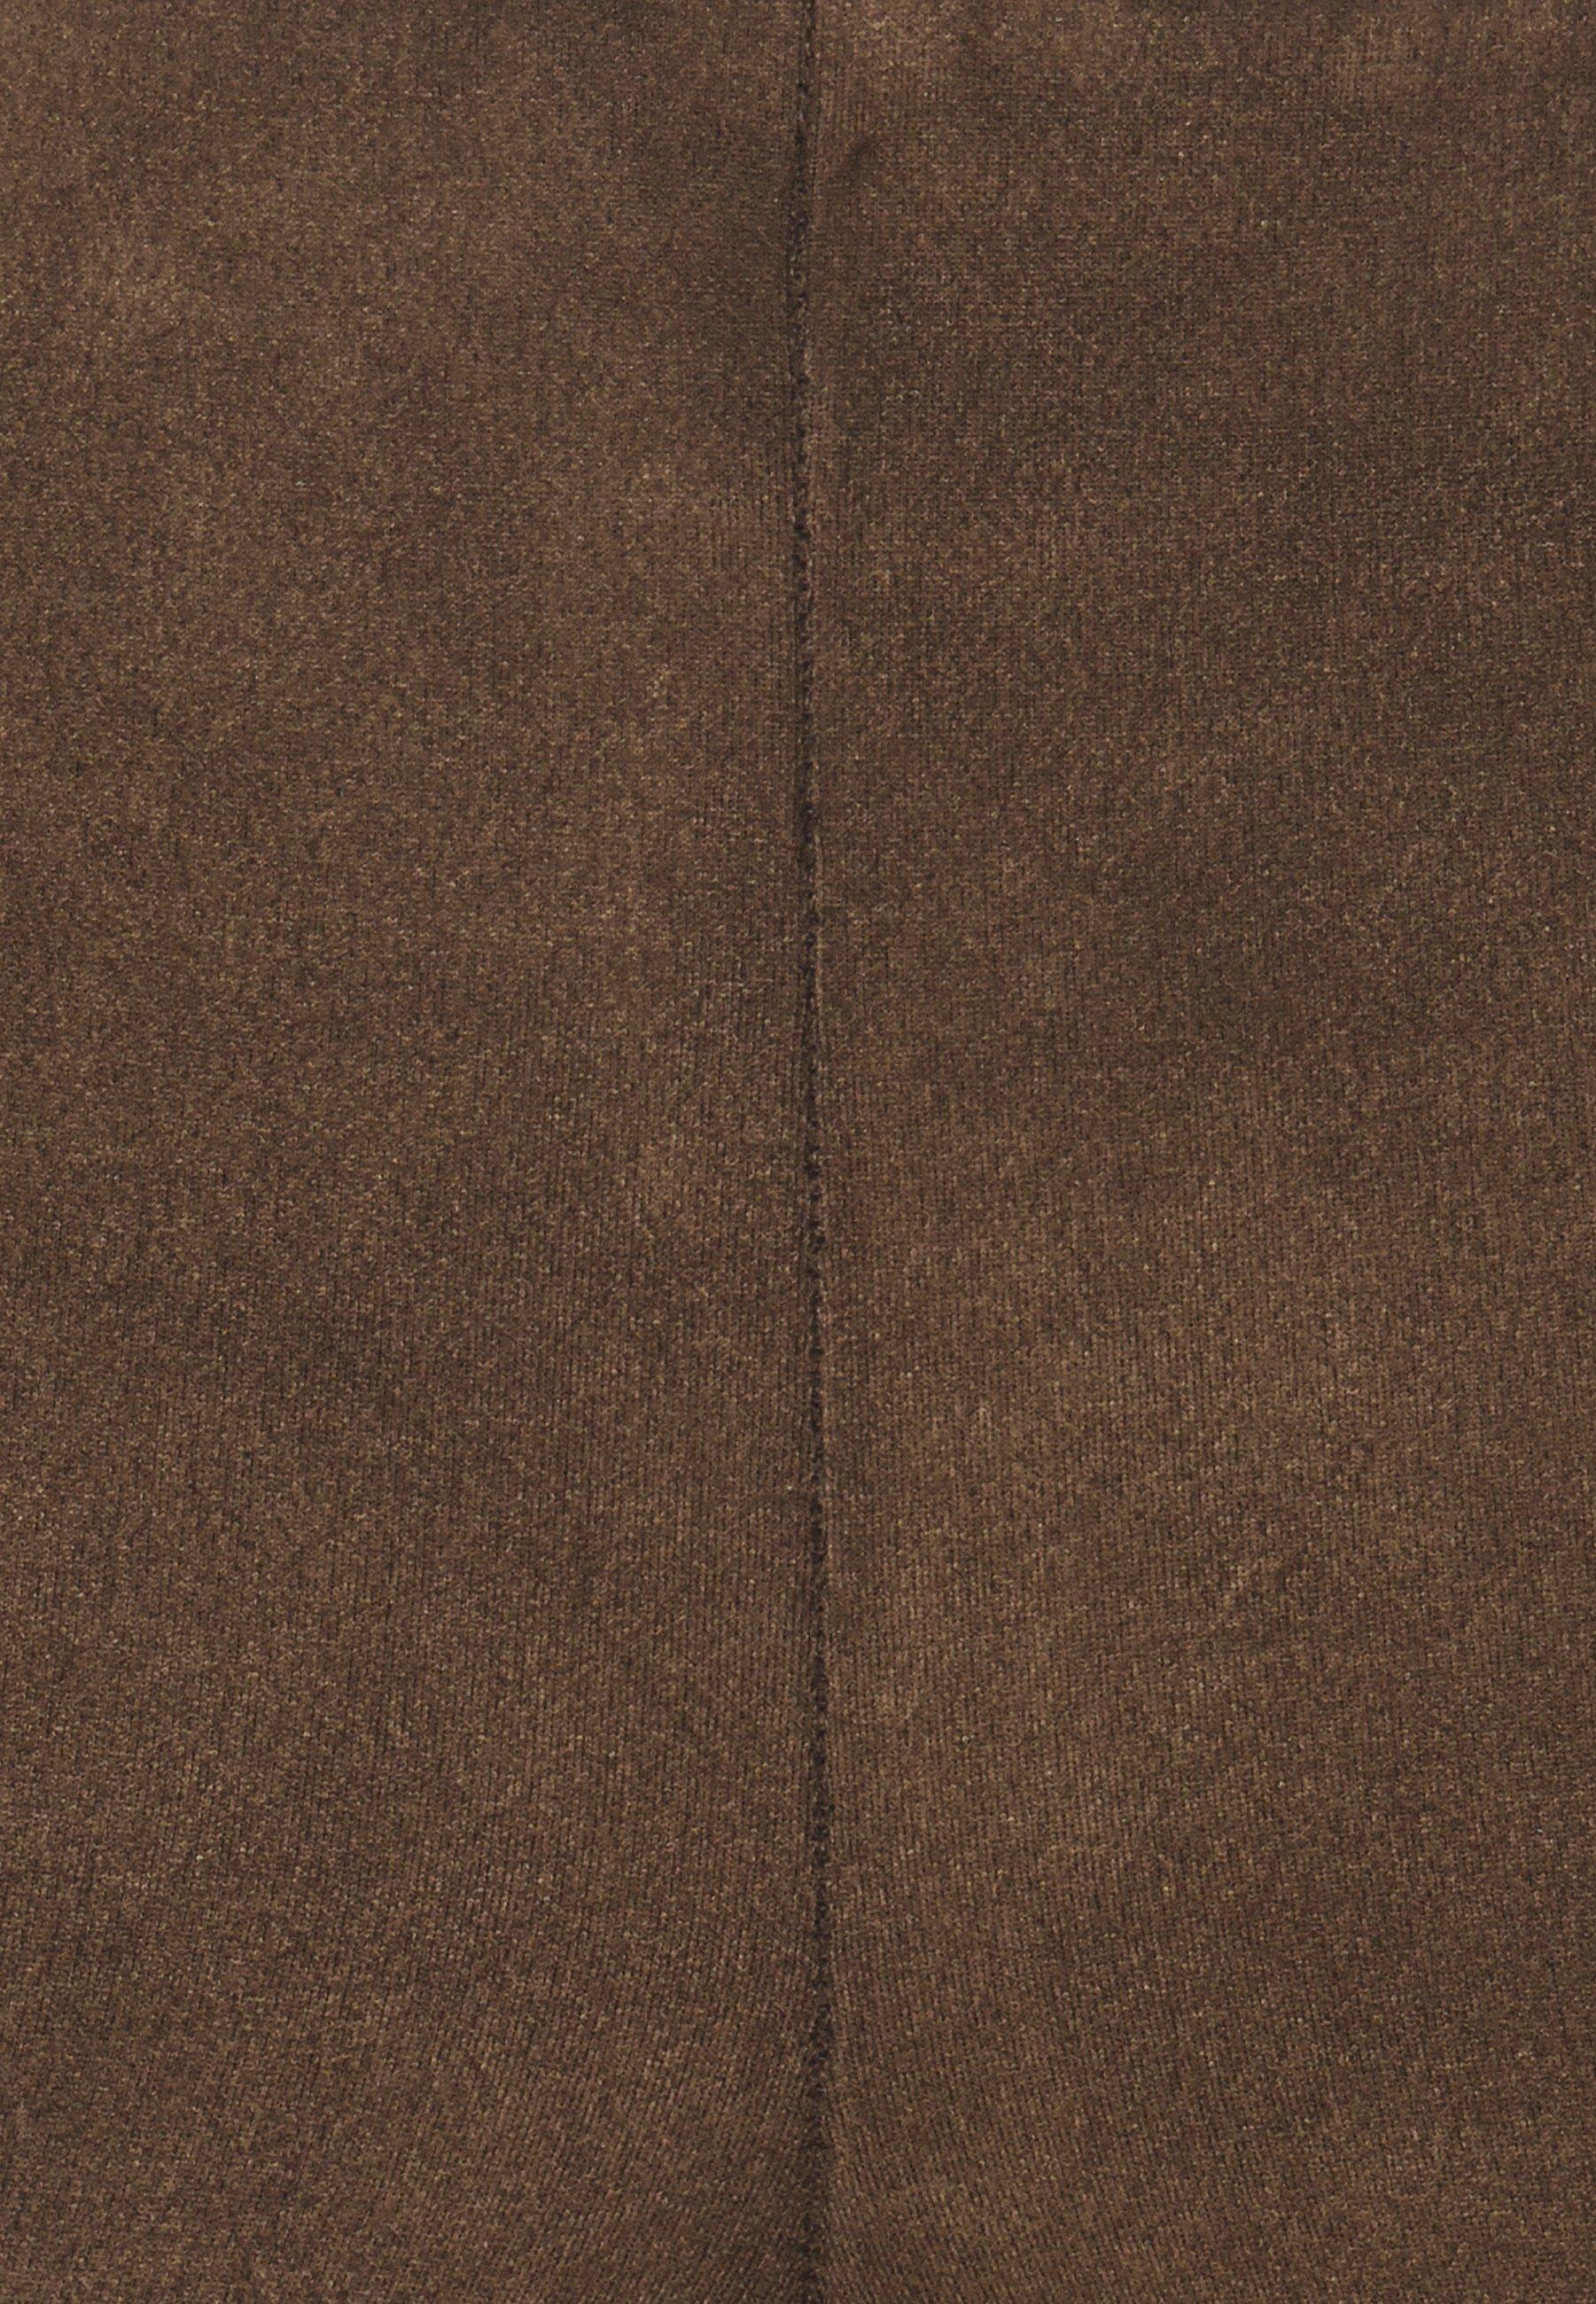 2020 New Women's Clothing Sand Copenhagen SHAMAR Trousers khaki l4xeJ8Wr7